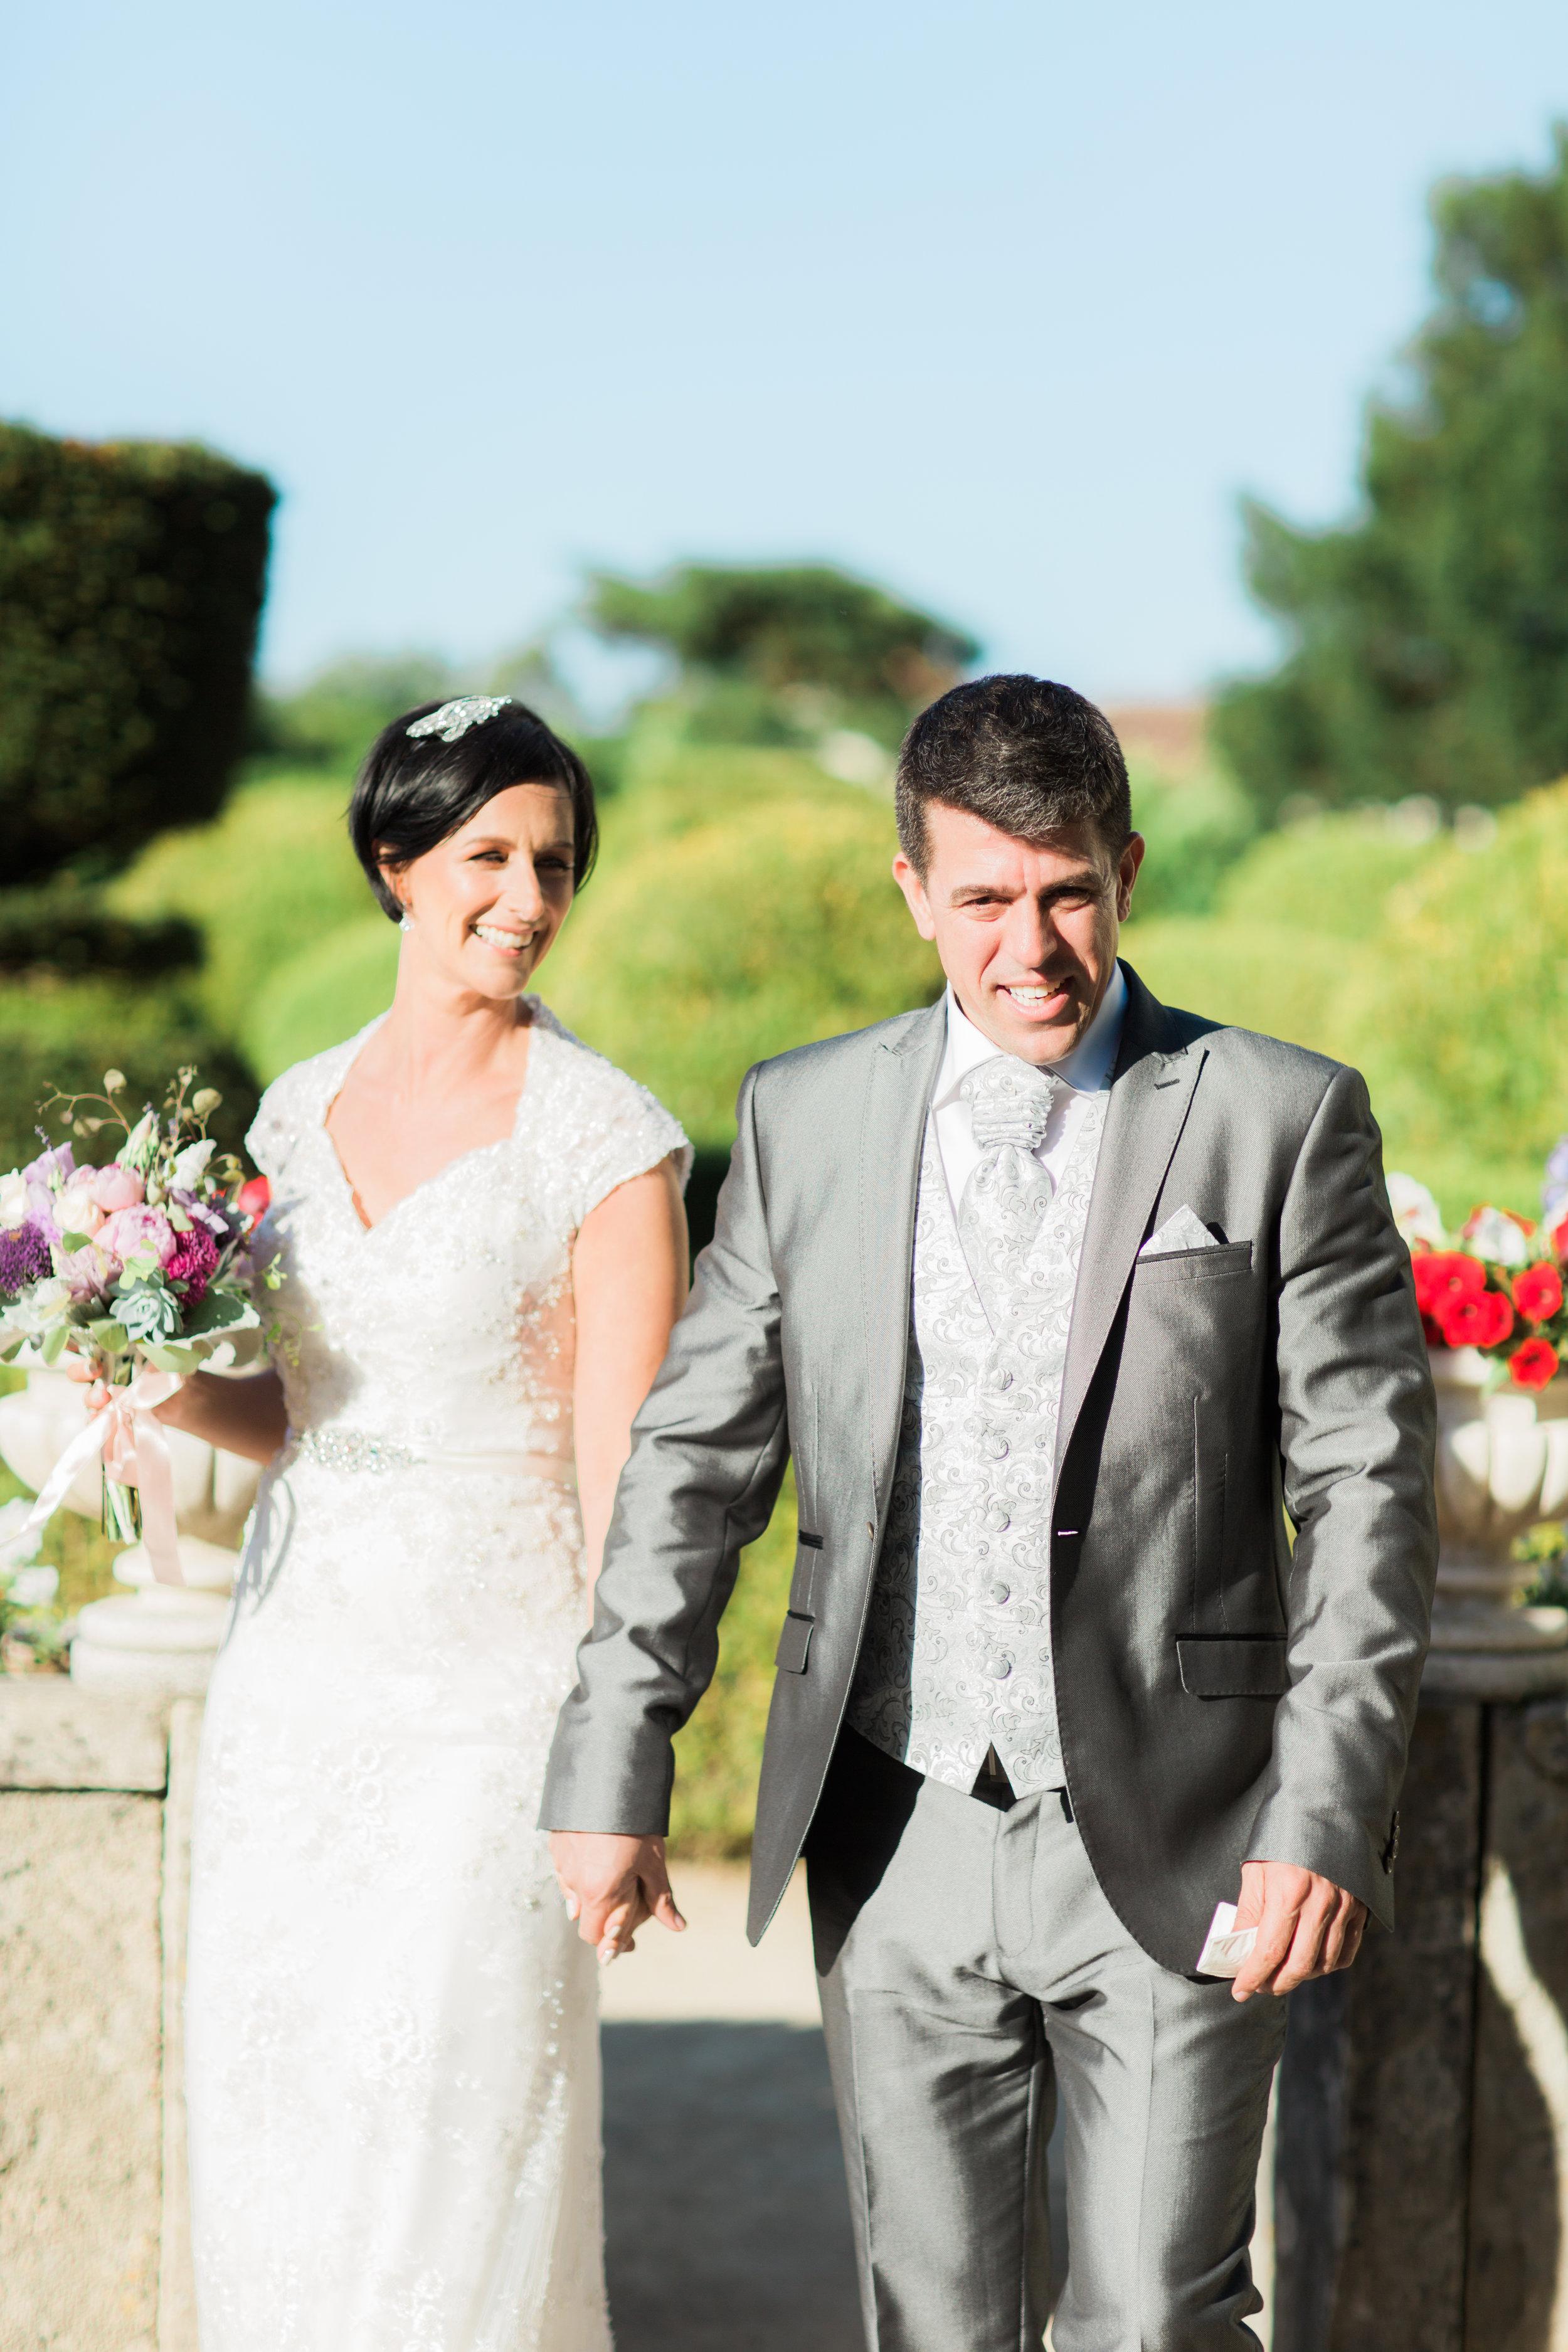 14 mariarao-wedding-palacio-seteais-90.jpg